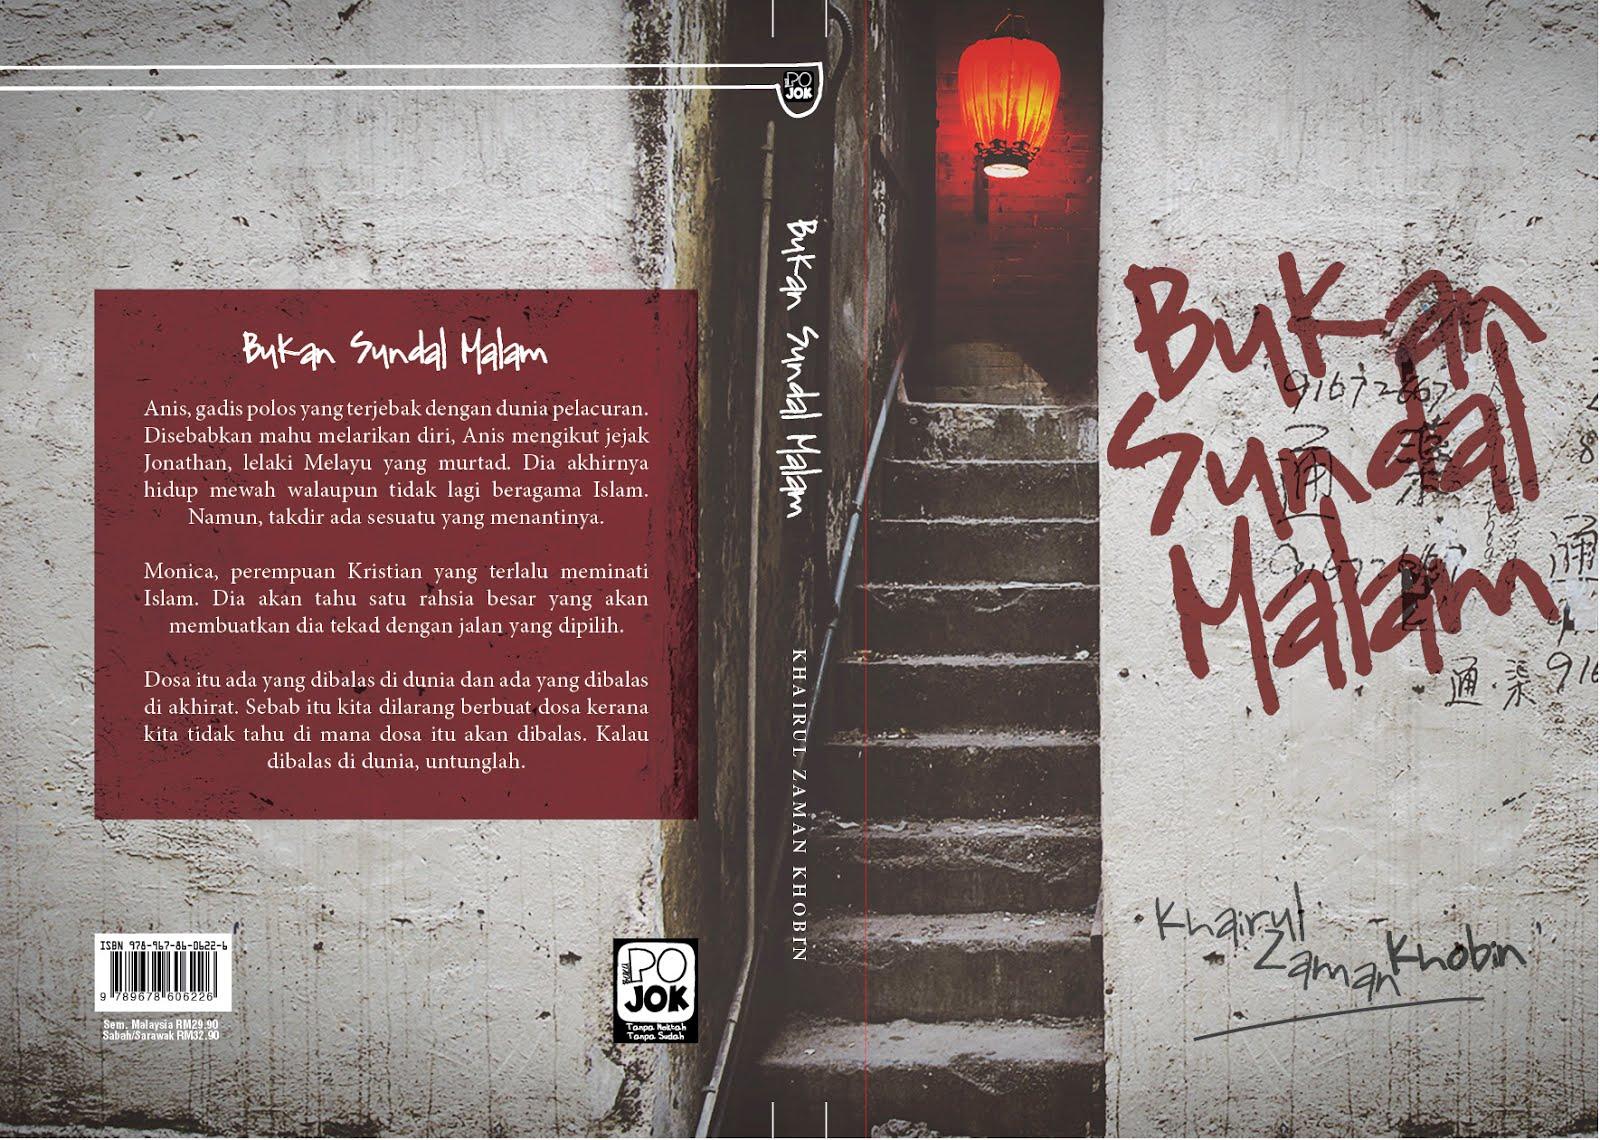 2016 Bukan Sundal Malam [Buku Pojok]